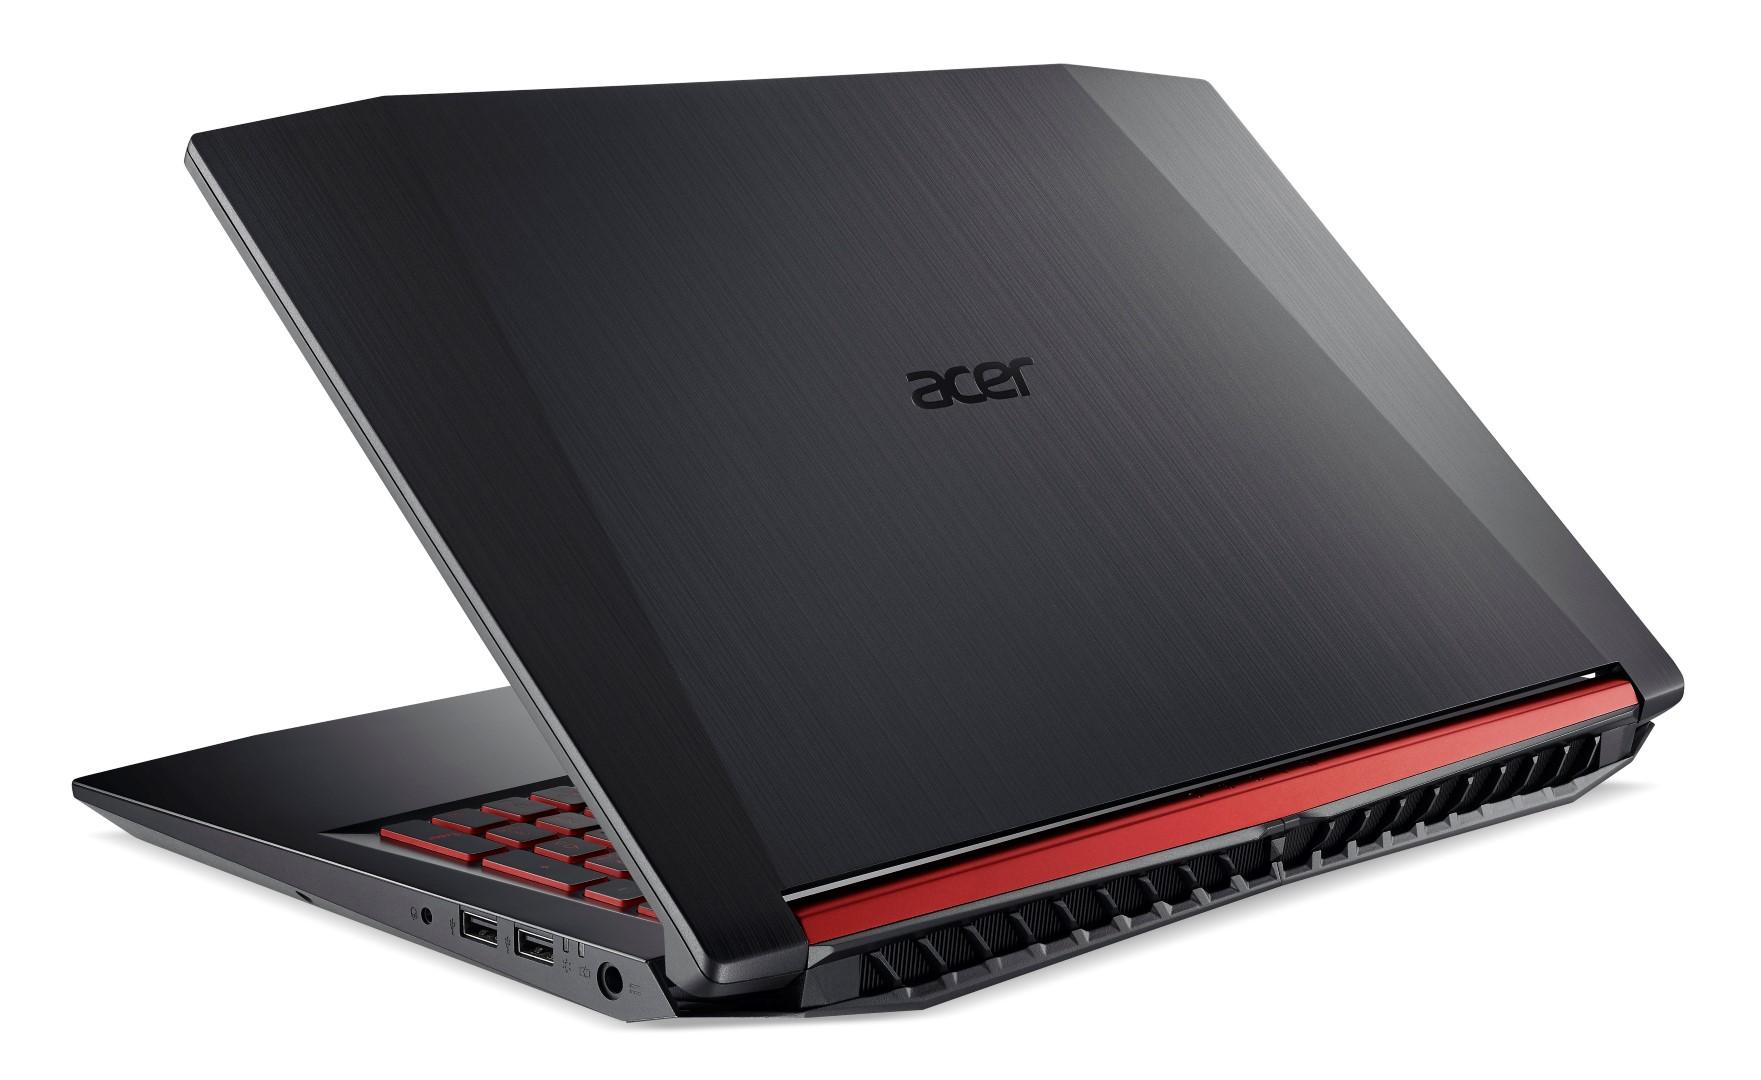 Ноутбук ASUS ROG GL553VE-FY200T 90NB0DX3-M02800 (Intel Core i7-7700HQ 2.8 GHz/12288Mb/1000Gb + 256Gb SSD/DVD-RW/nVidia GeForce GTX 1050Ti 4096Mb/Wi-Fi/Cam/15.6/1920x1080/Windows 10 64-bit)